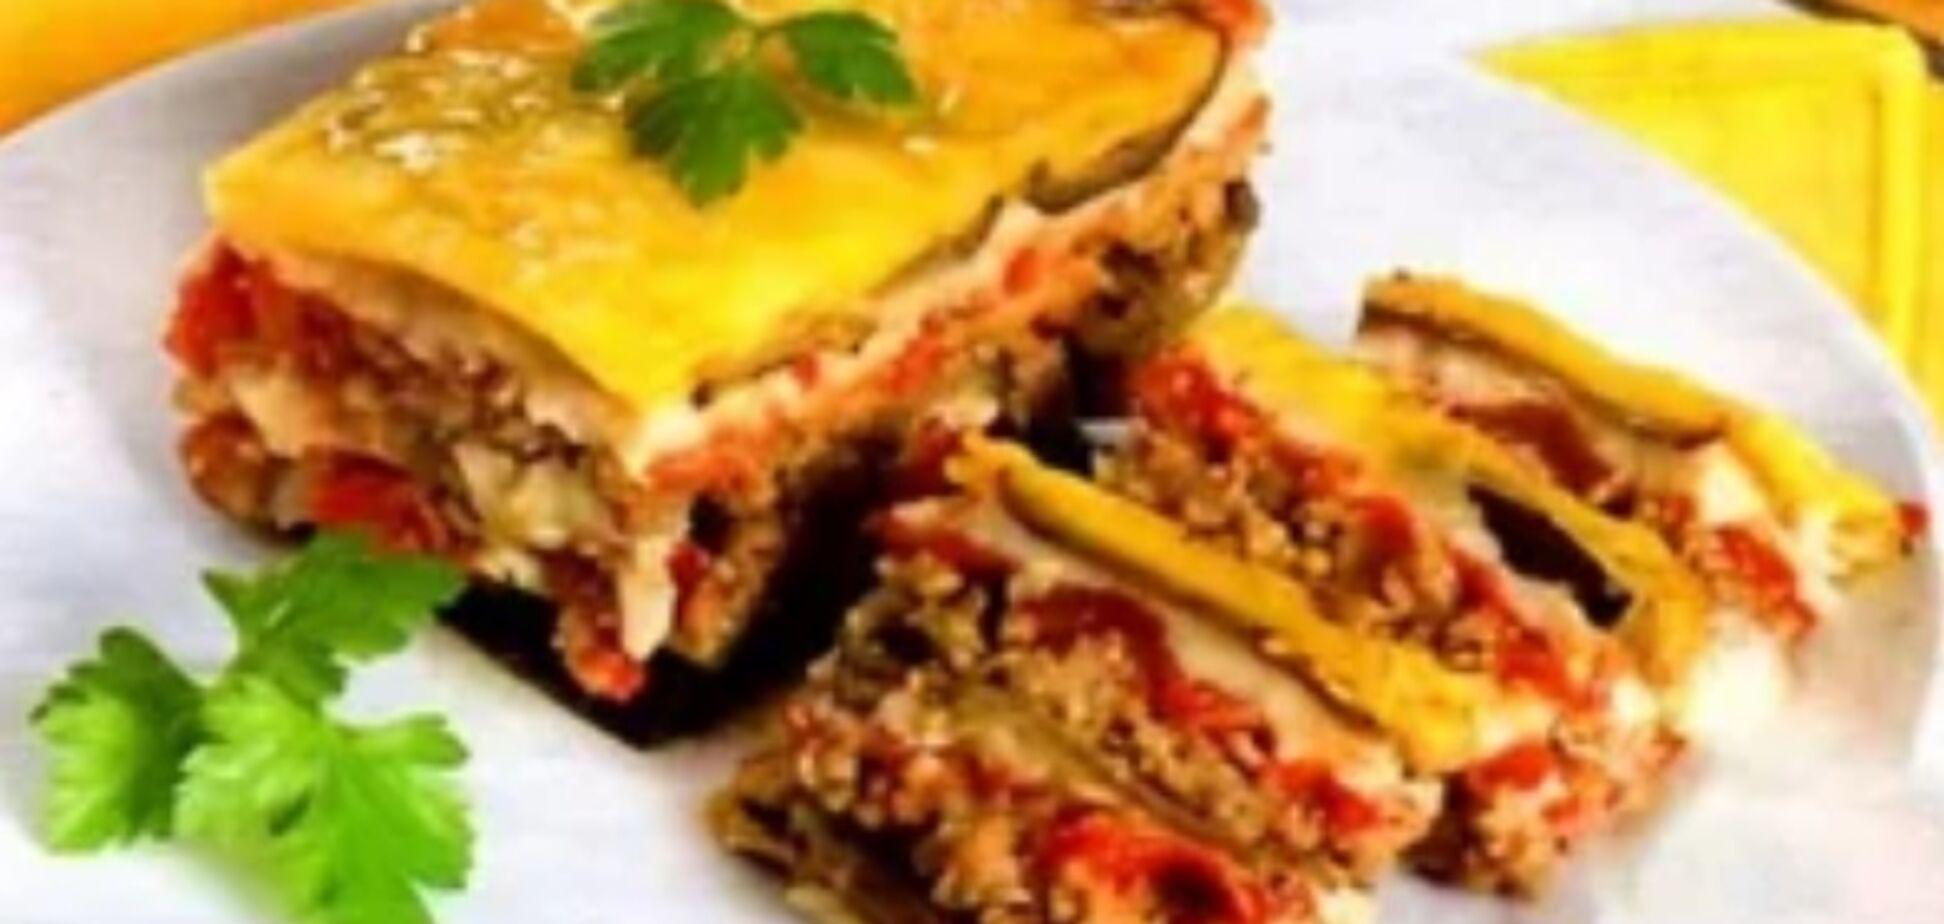 Рецепт приголомшливо смачної екзотичної страви з картоплею